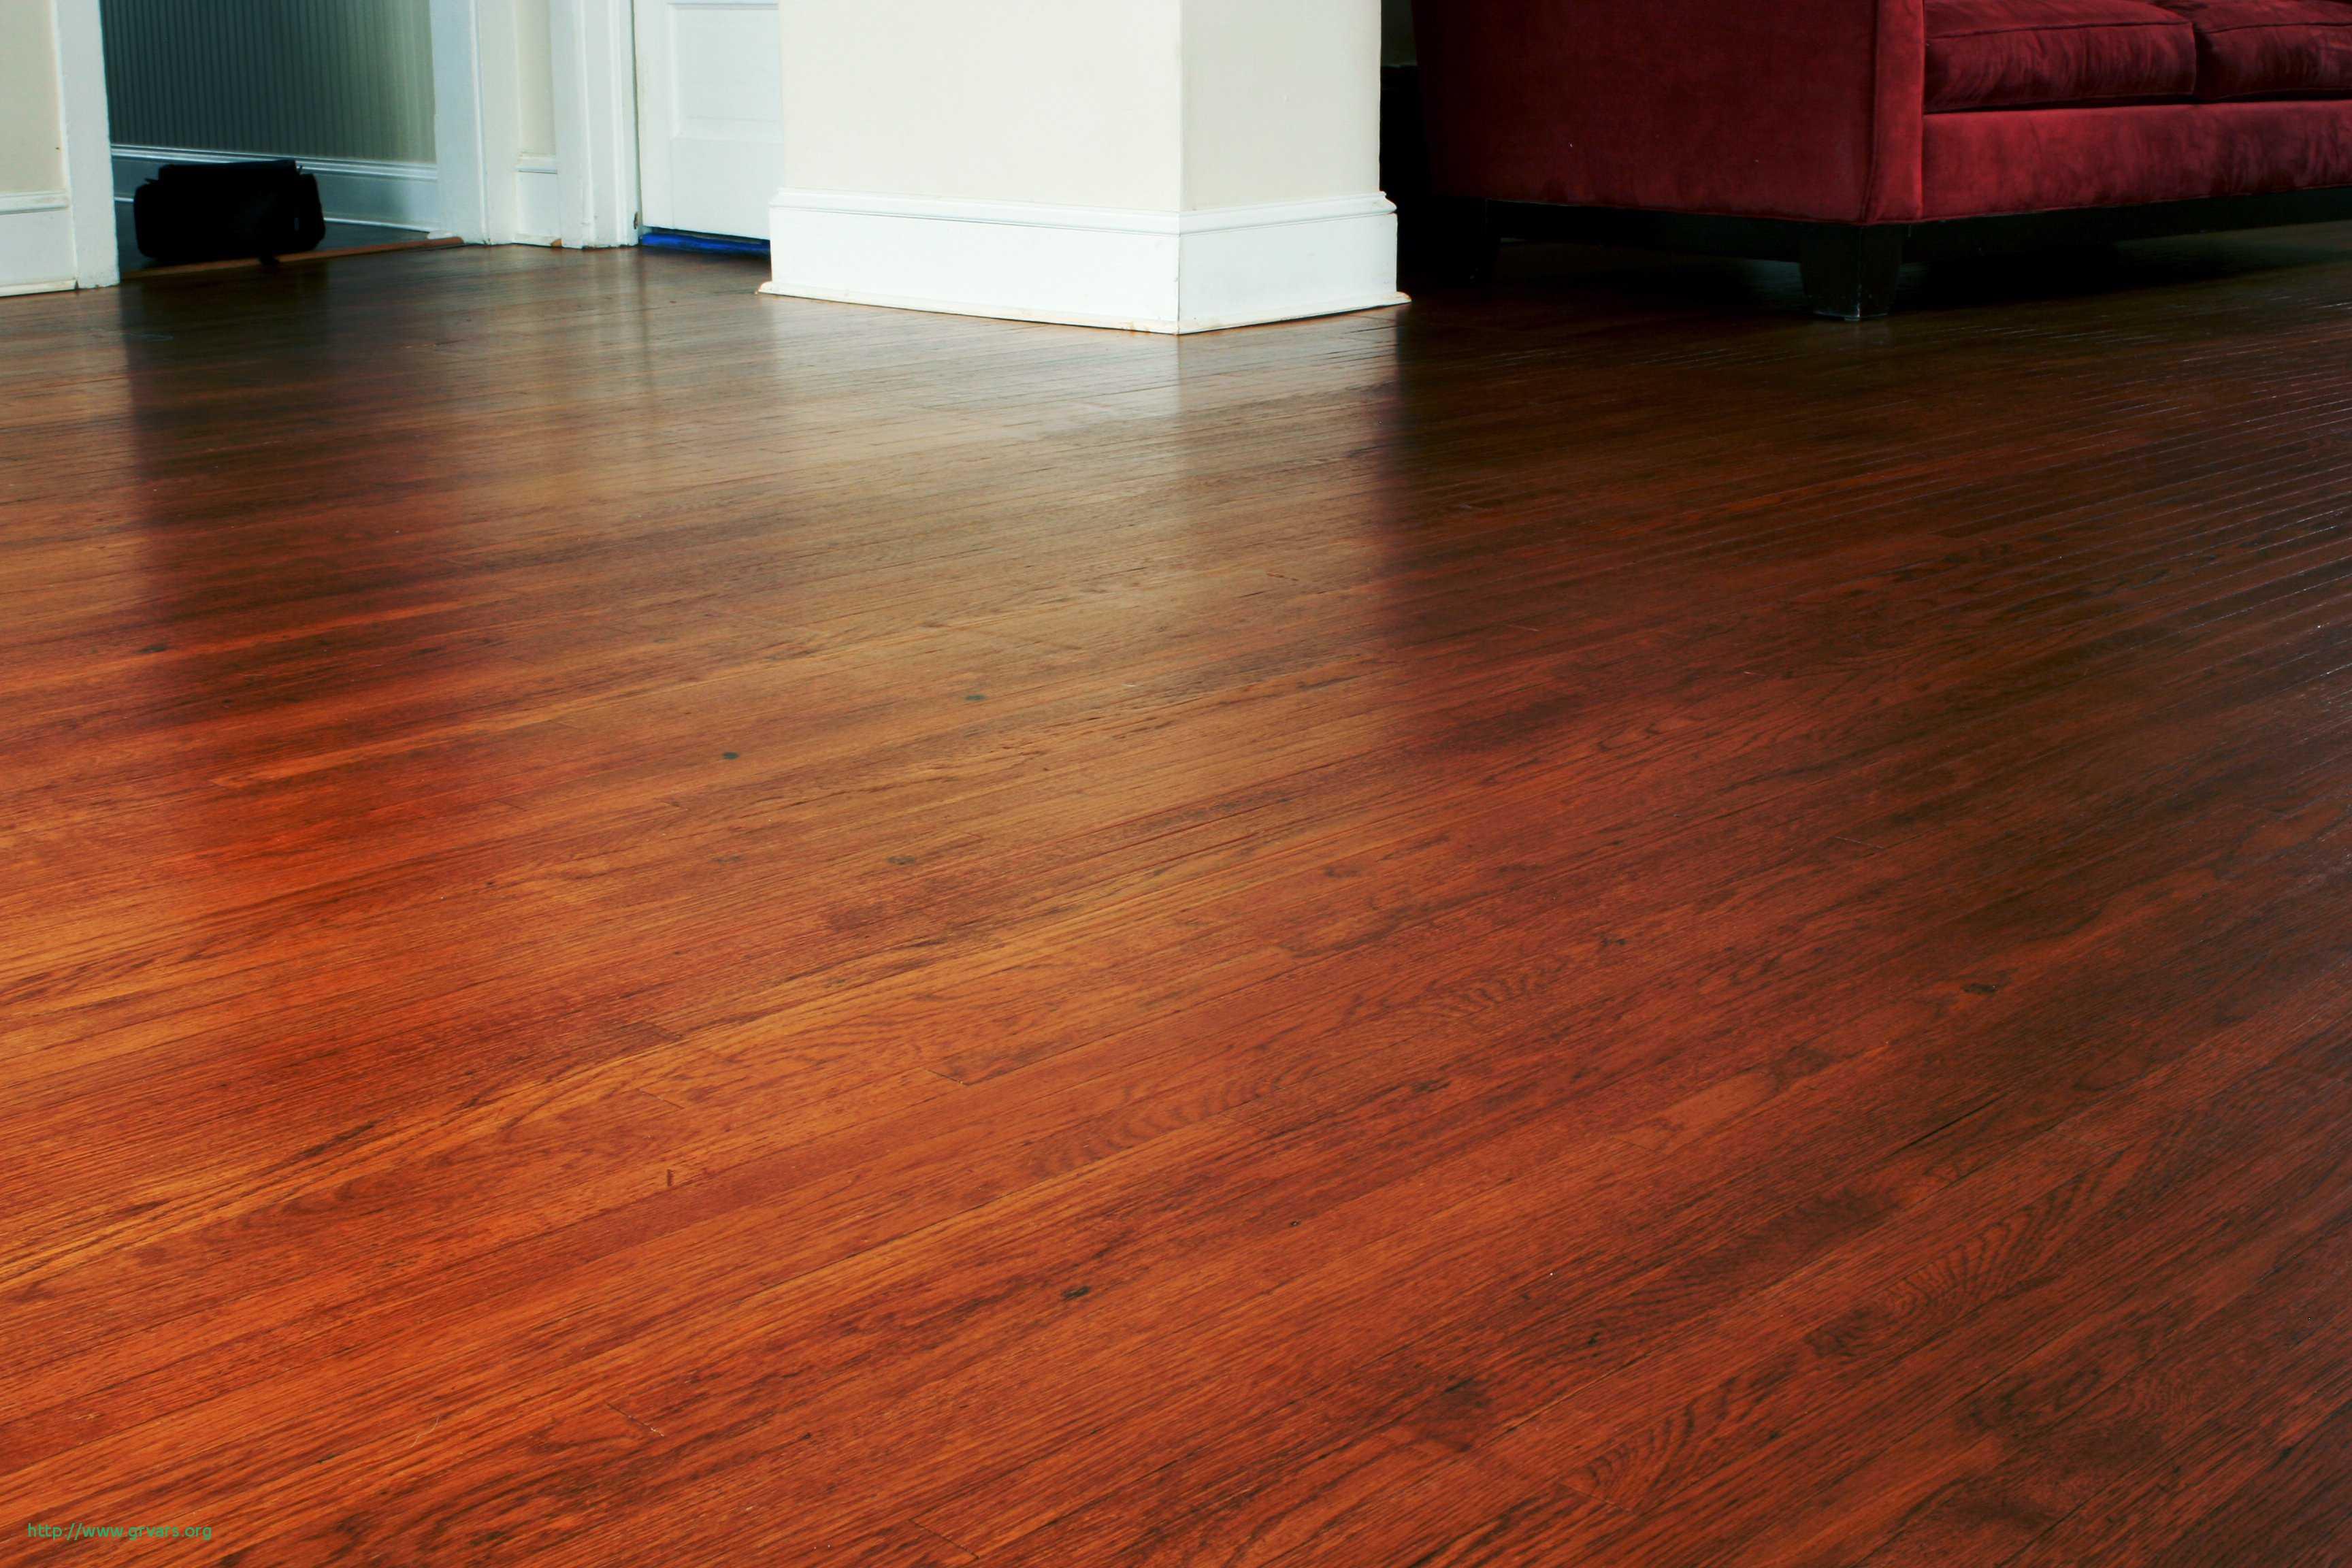 espresso oak hardwood flooring of discount hardwood floors and molding beau how to diagnose and repair within discount hardwood floors and molding beau how to diagnose and repair sloping floors homeadvisor